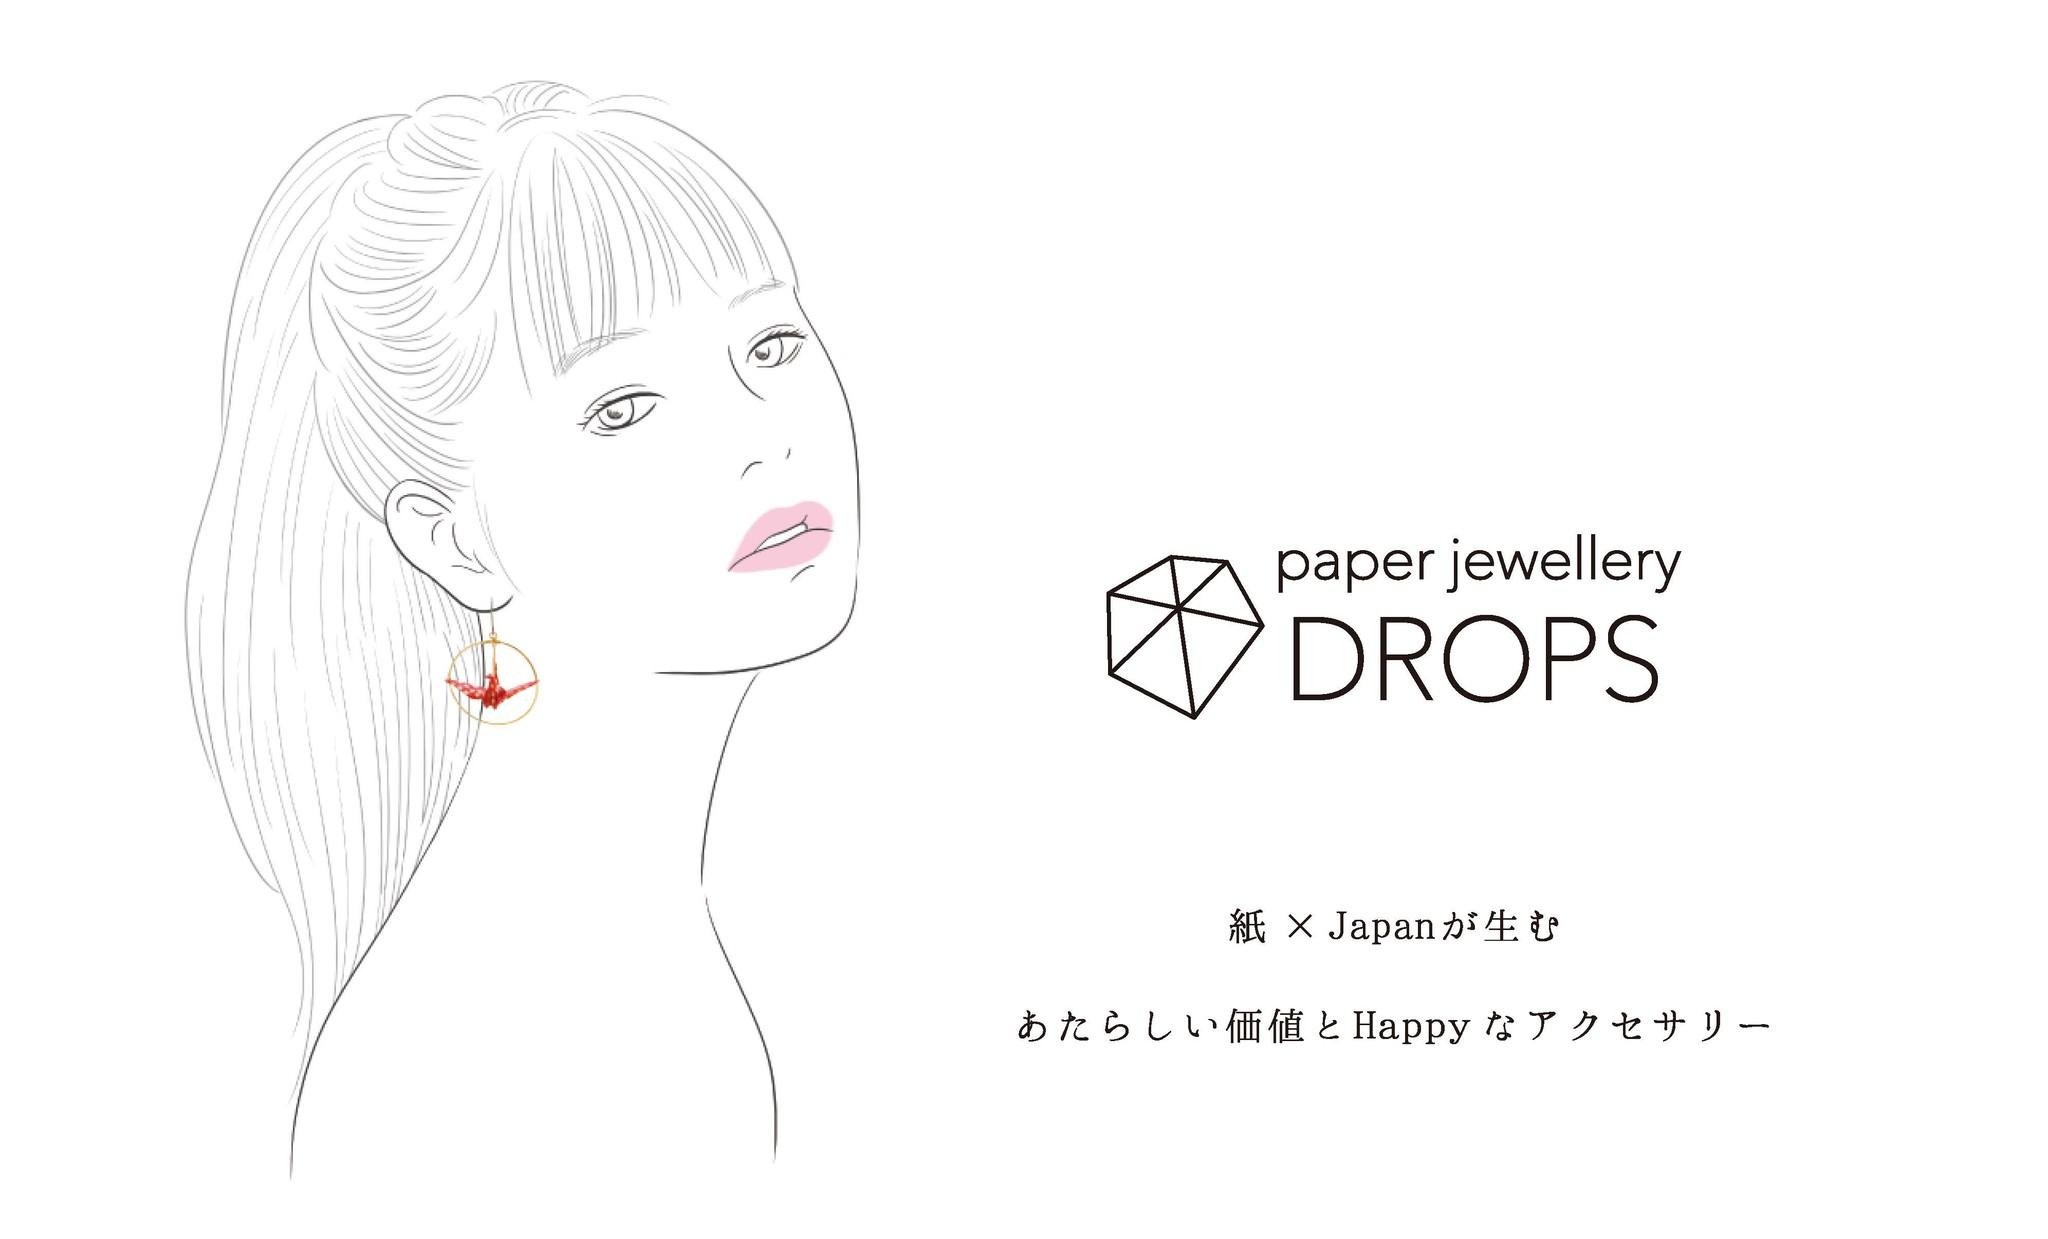 paper jewellery DROPS